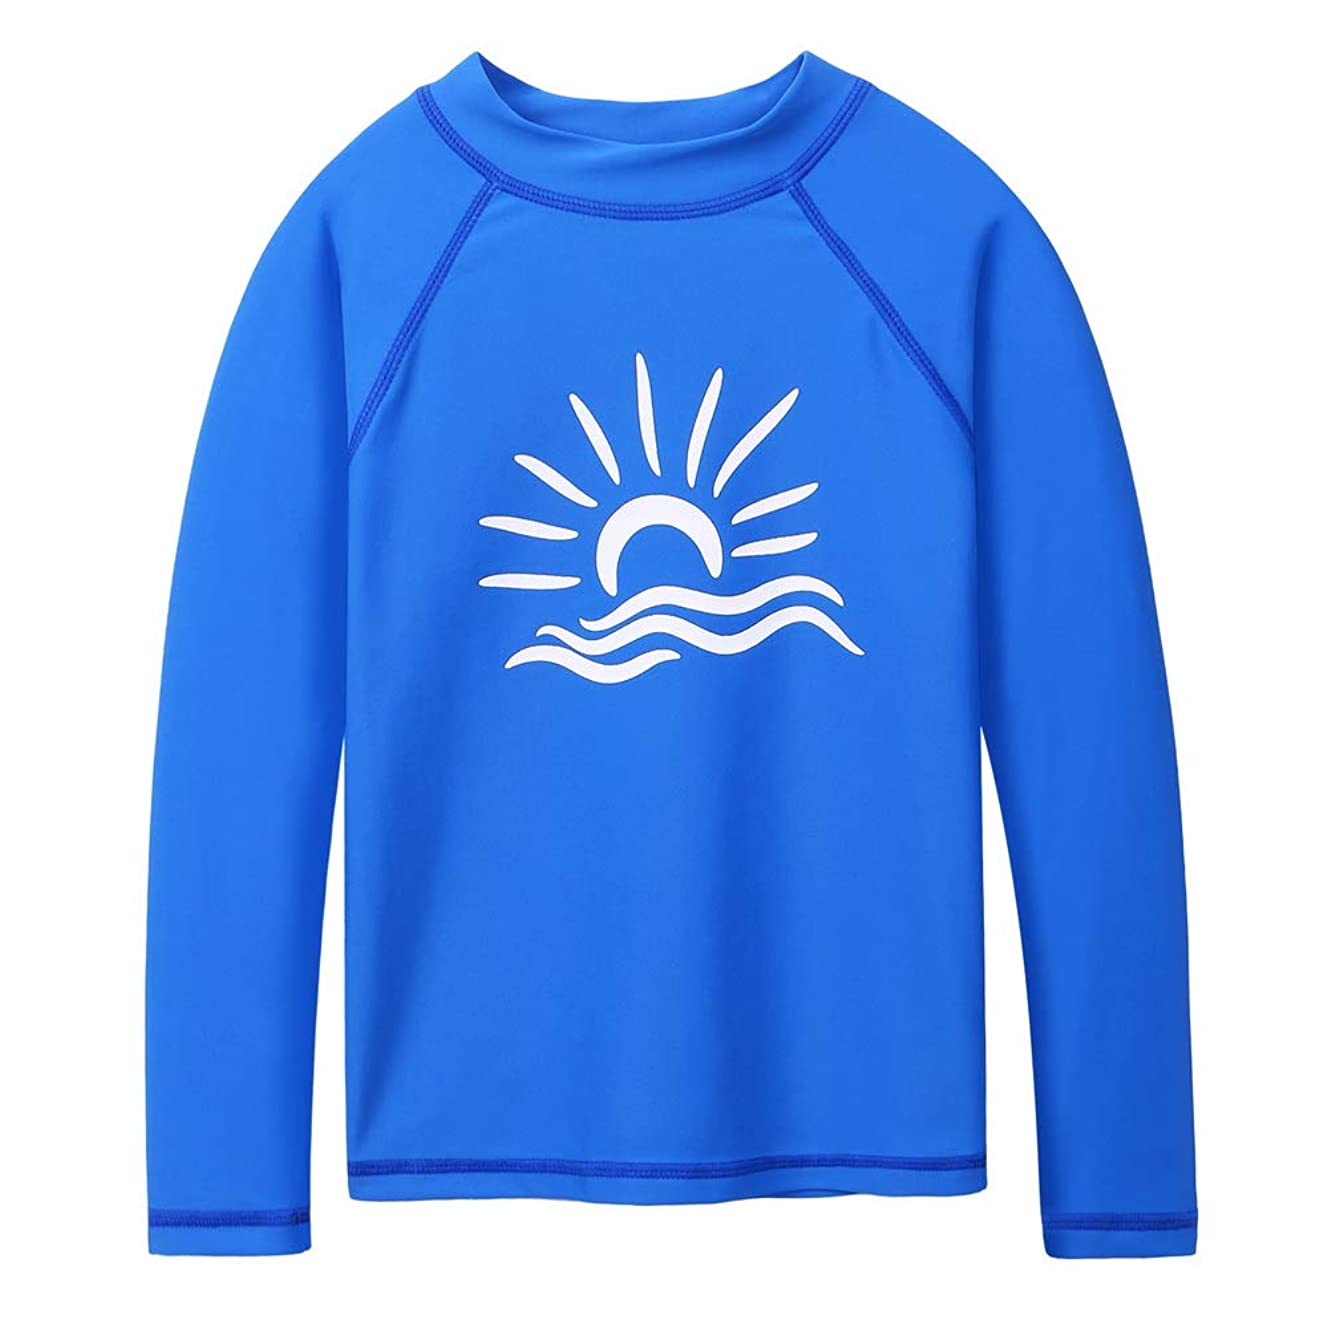 TFJH E Girls & Boys Long Sleeve Rash Gurad Suit UPF 50+ Kids Athletic Tops Swimwear Sunsuits 3-10Years